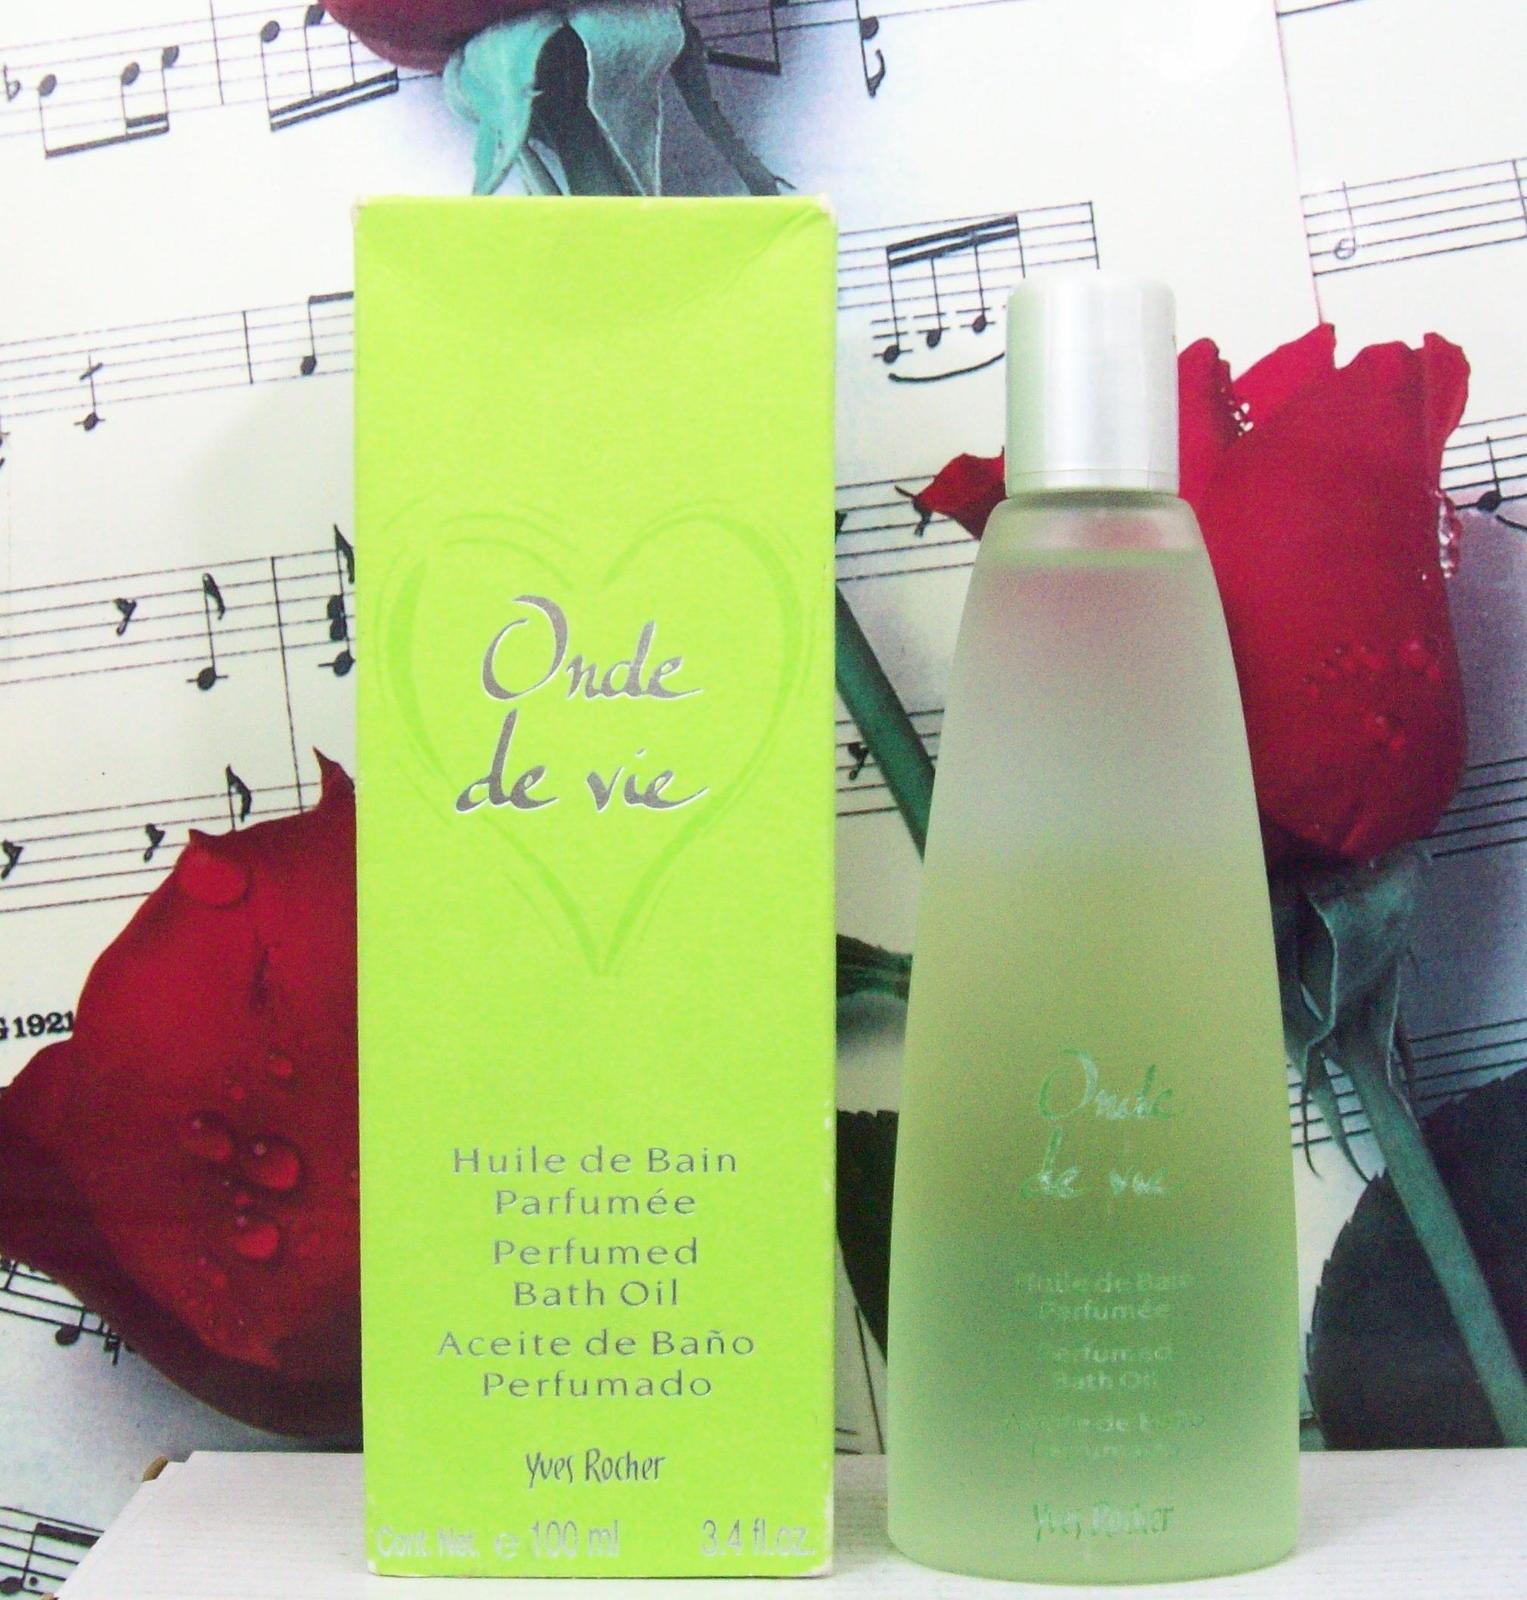 Yves Rocher Onde De Vie Perfumed Bath Oil 3.4 FL. OZ.  - $99.99